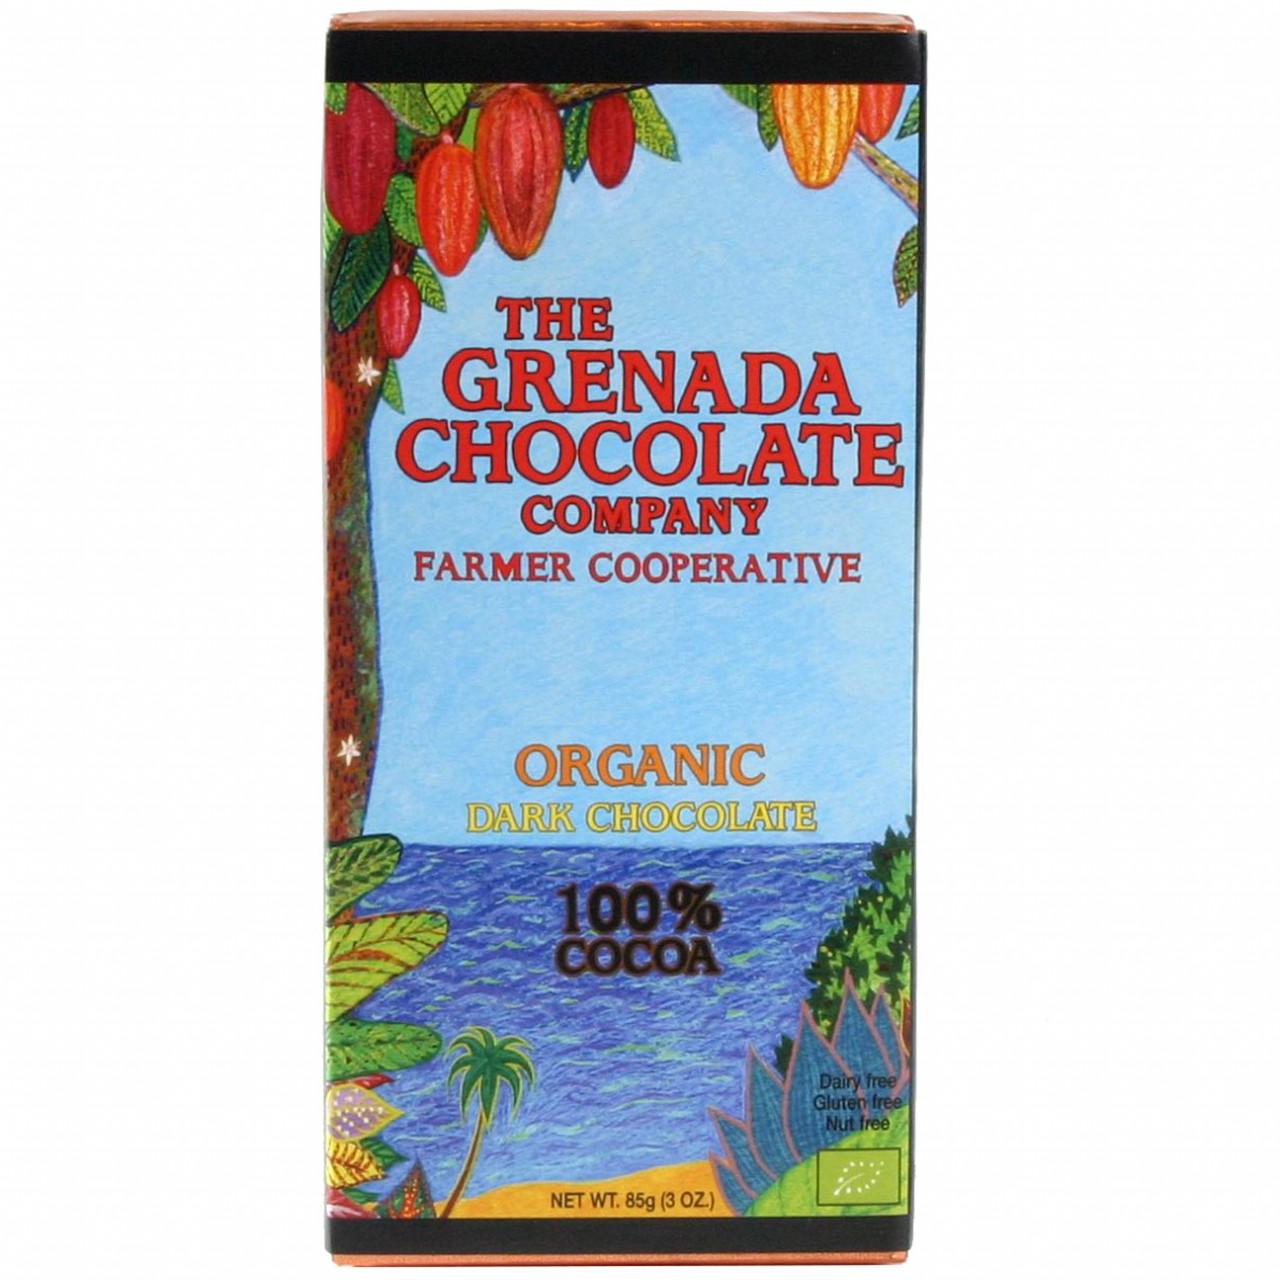 Grenada Chocolate, dunkle Bio Schokolade, Organic Dark Chocolate, chocolat noir, cocoa cacao, Mott Green - Tablette de chocolat, chocolat sans noix, Grenada, chocolat de Grenade - Chocolats-De-Luxe